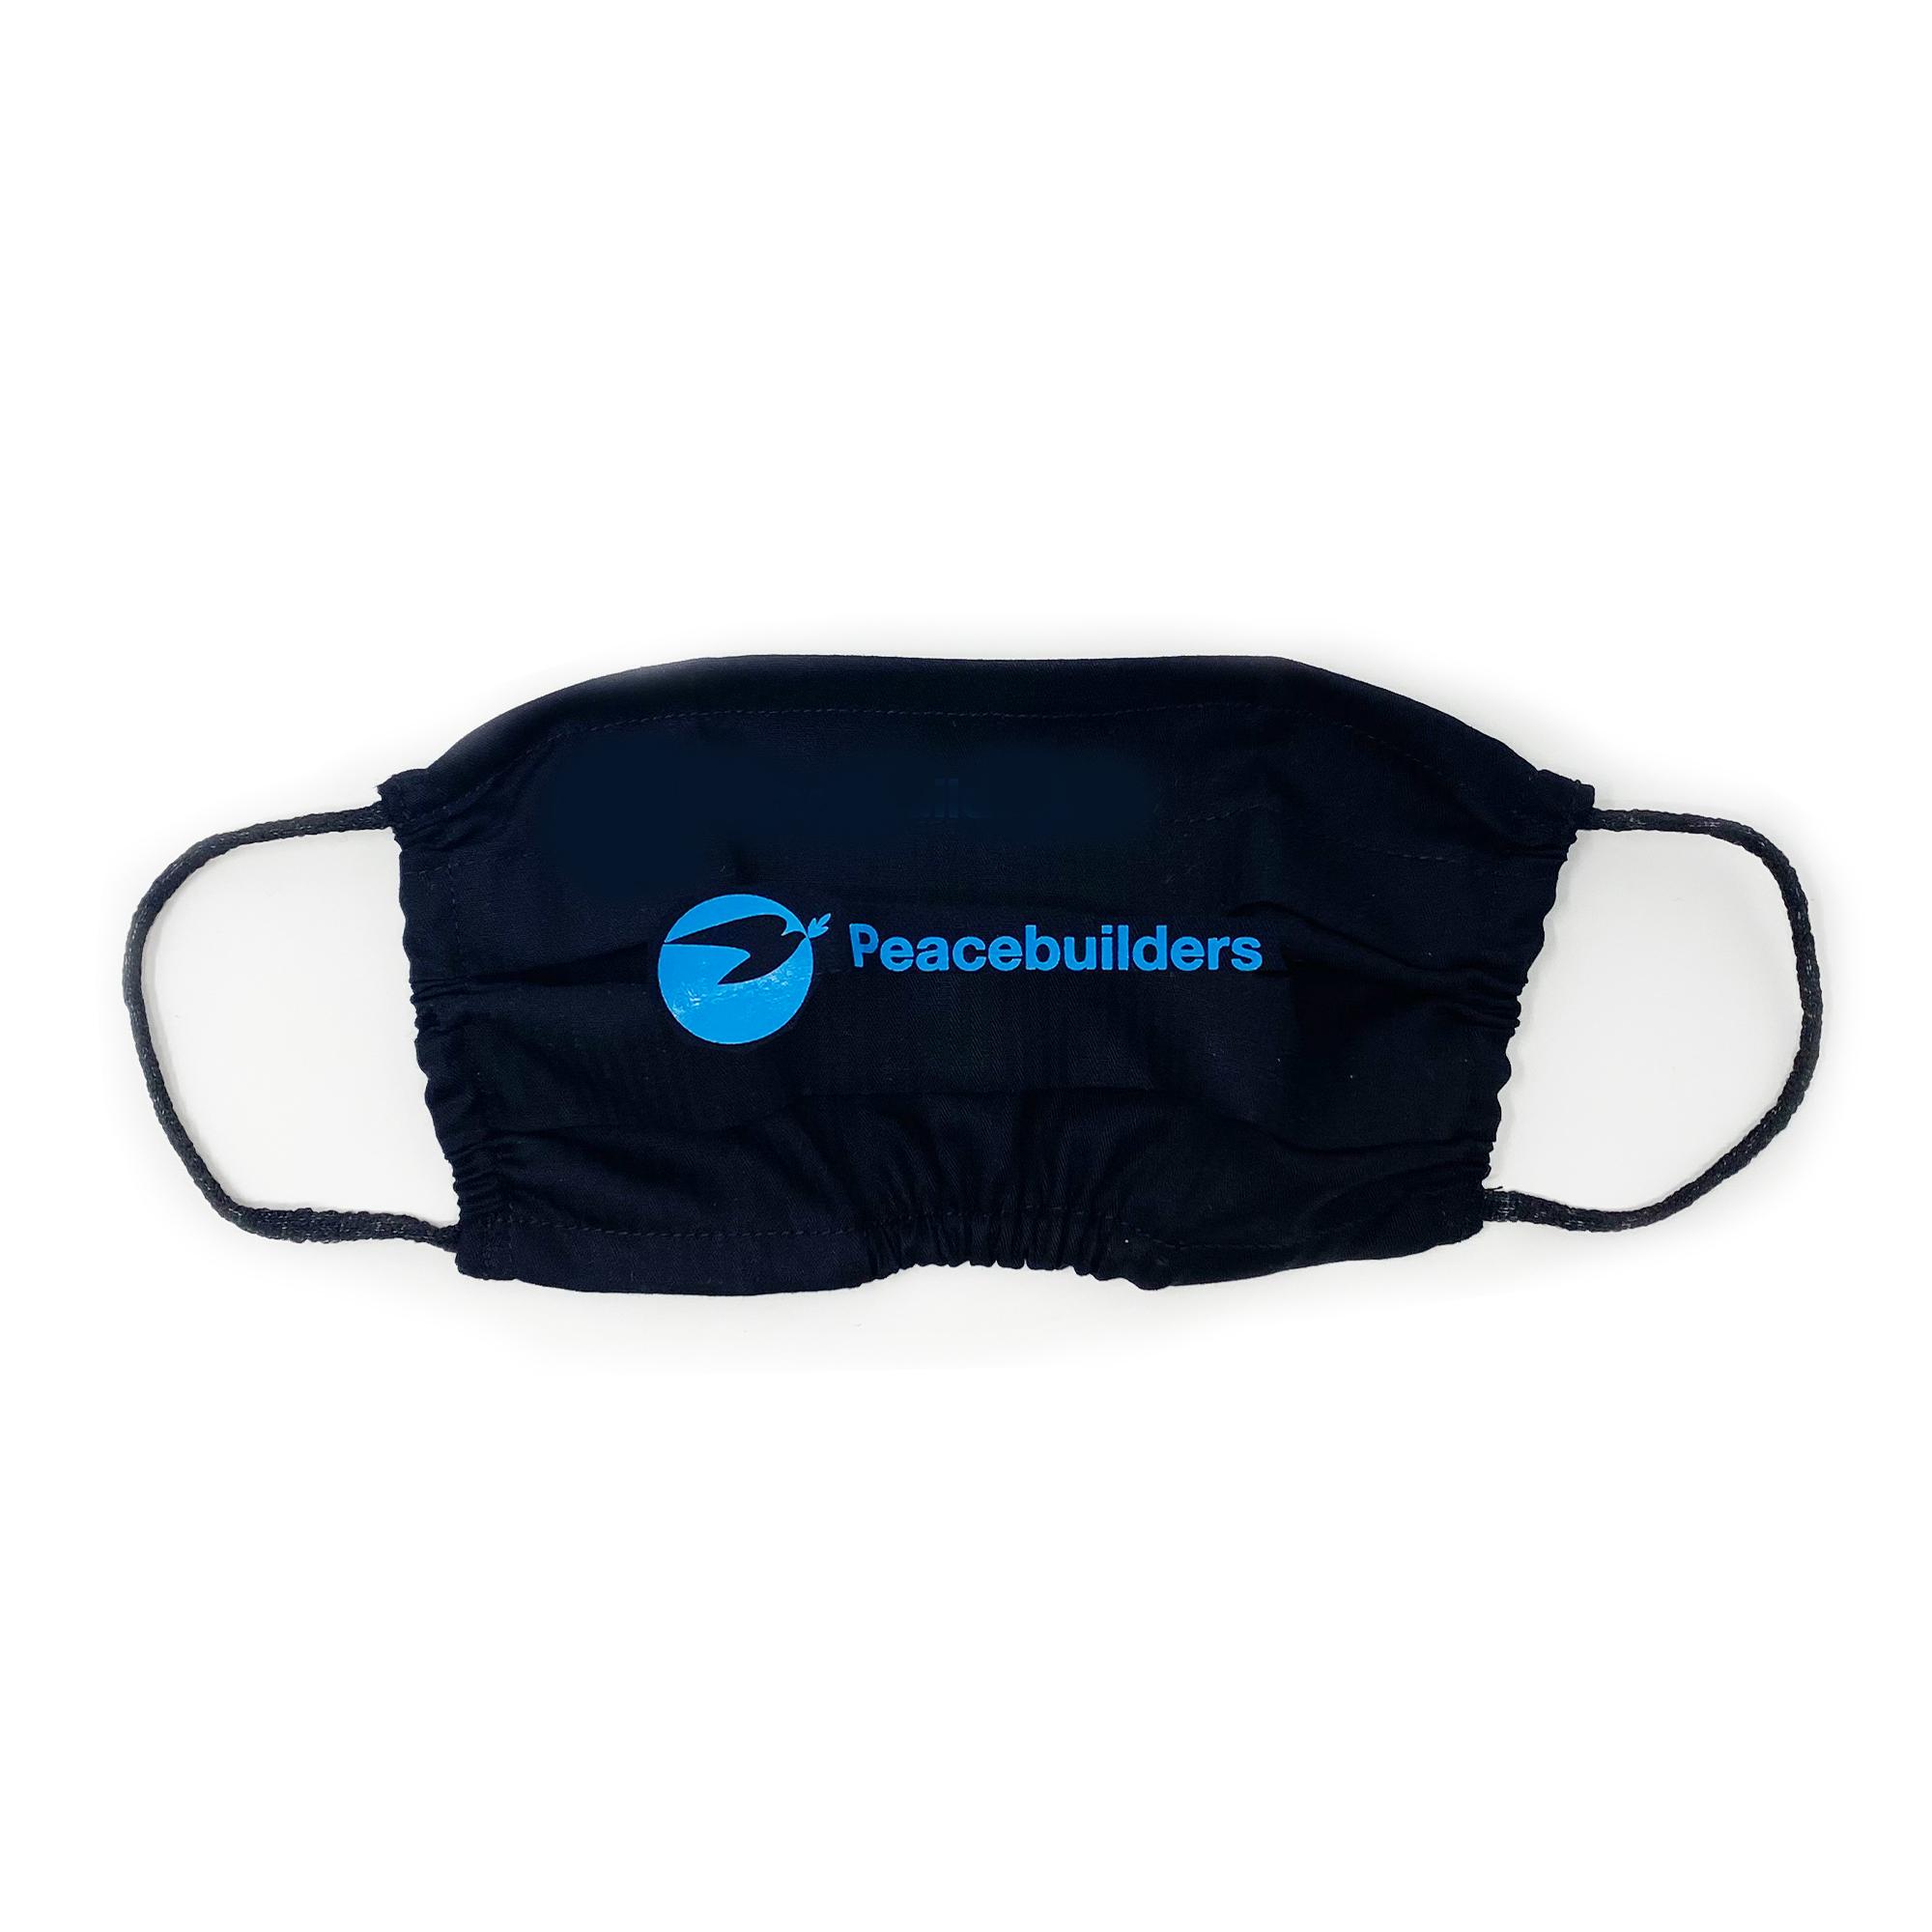 Peacebuilders - Facial Masks